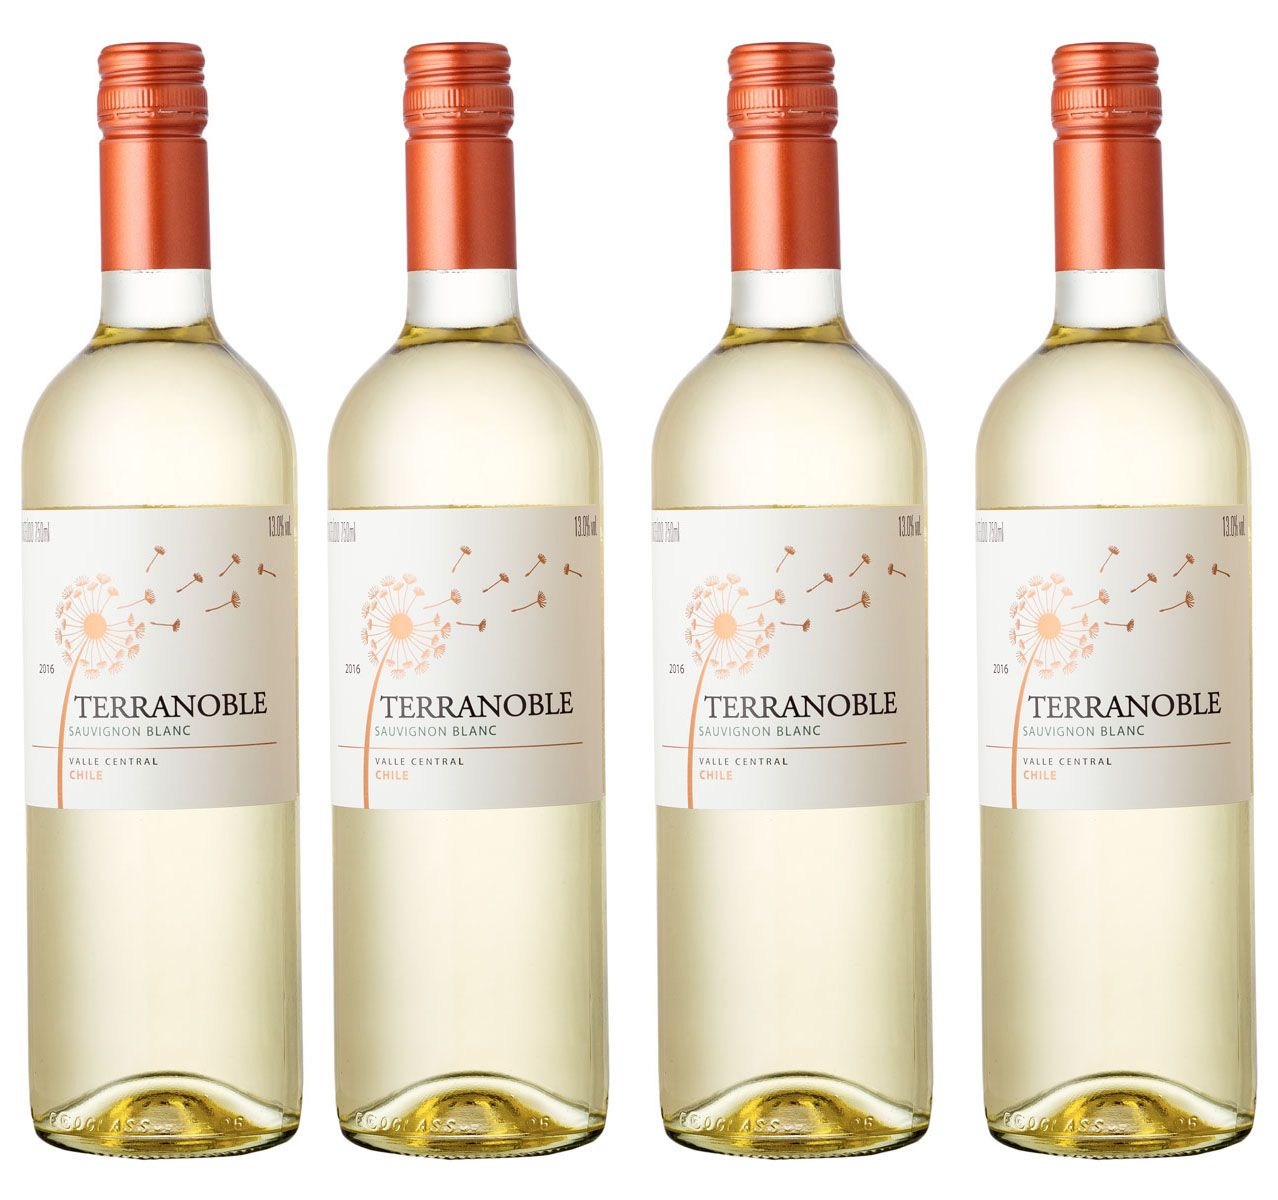 Kit com 4 Garrafas Terranoble Sauvignon Blanc